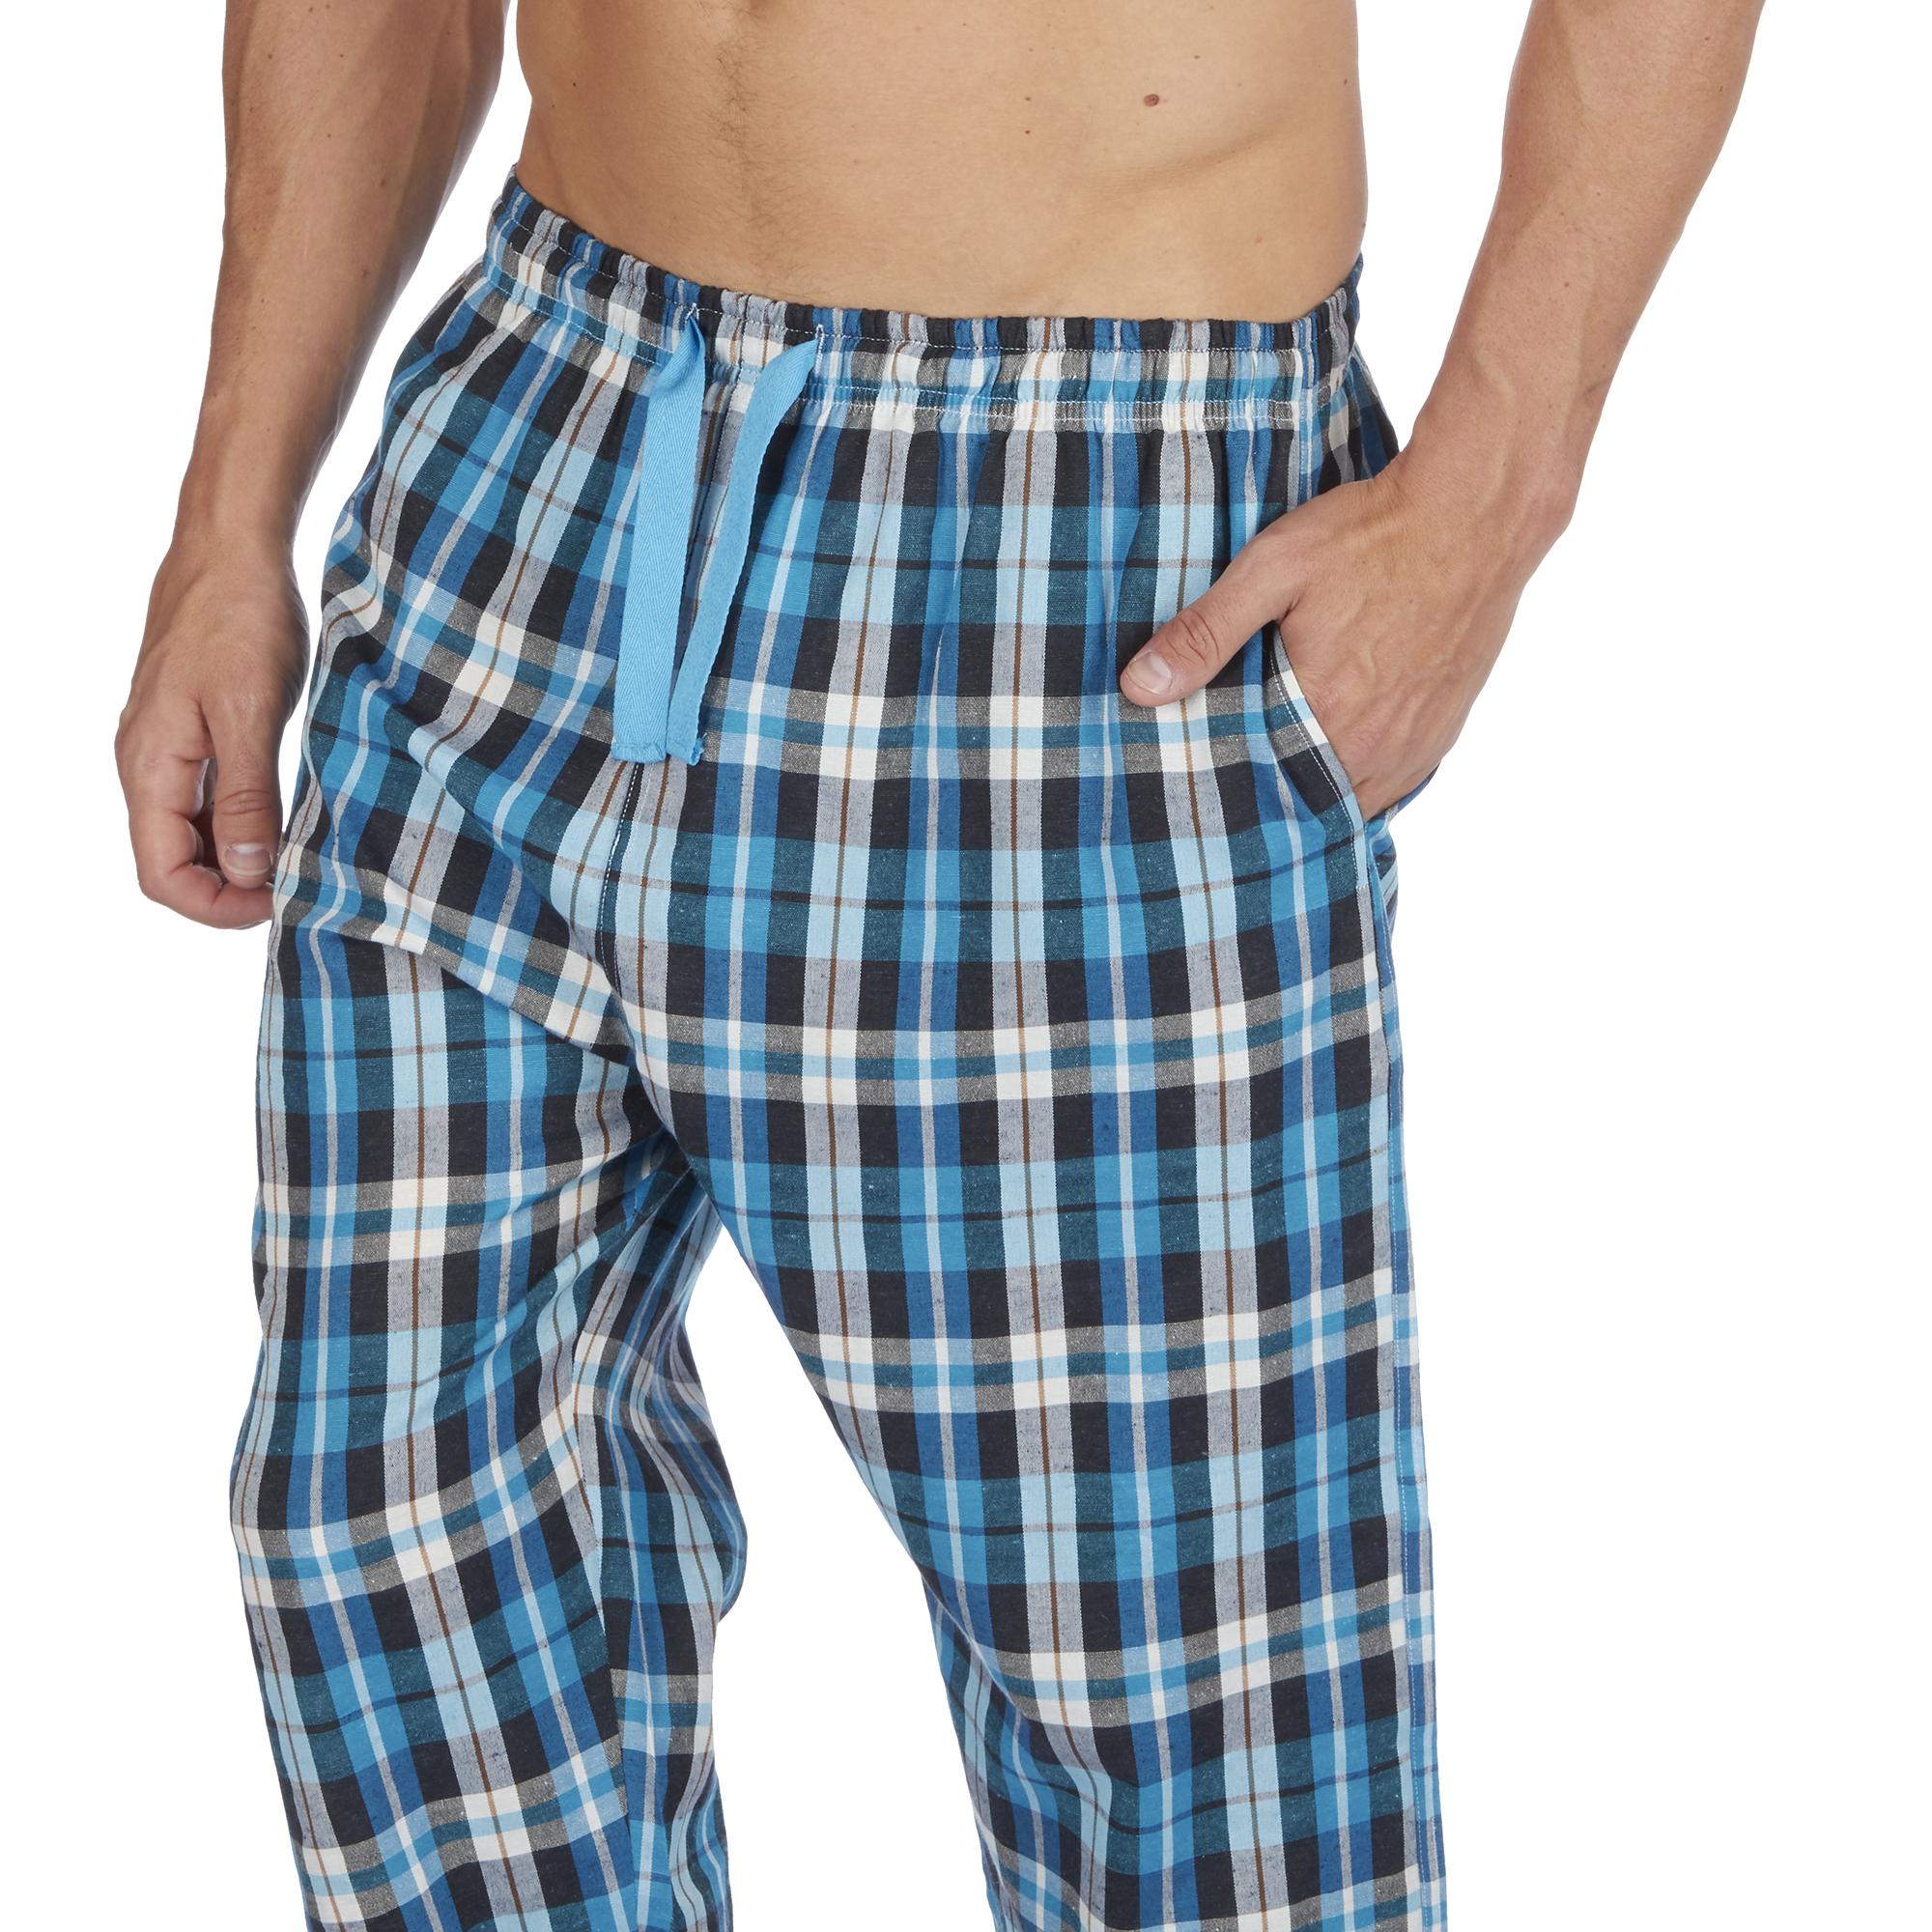 Jason-Jones-Homme-Carreaux-Tisse-Pyjama-Pantalon-en-Coton-Melange-Serge-PJ-Lounge-Pants miniature 21